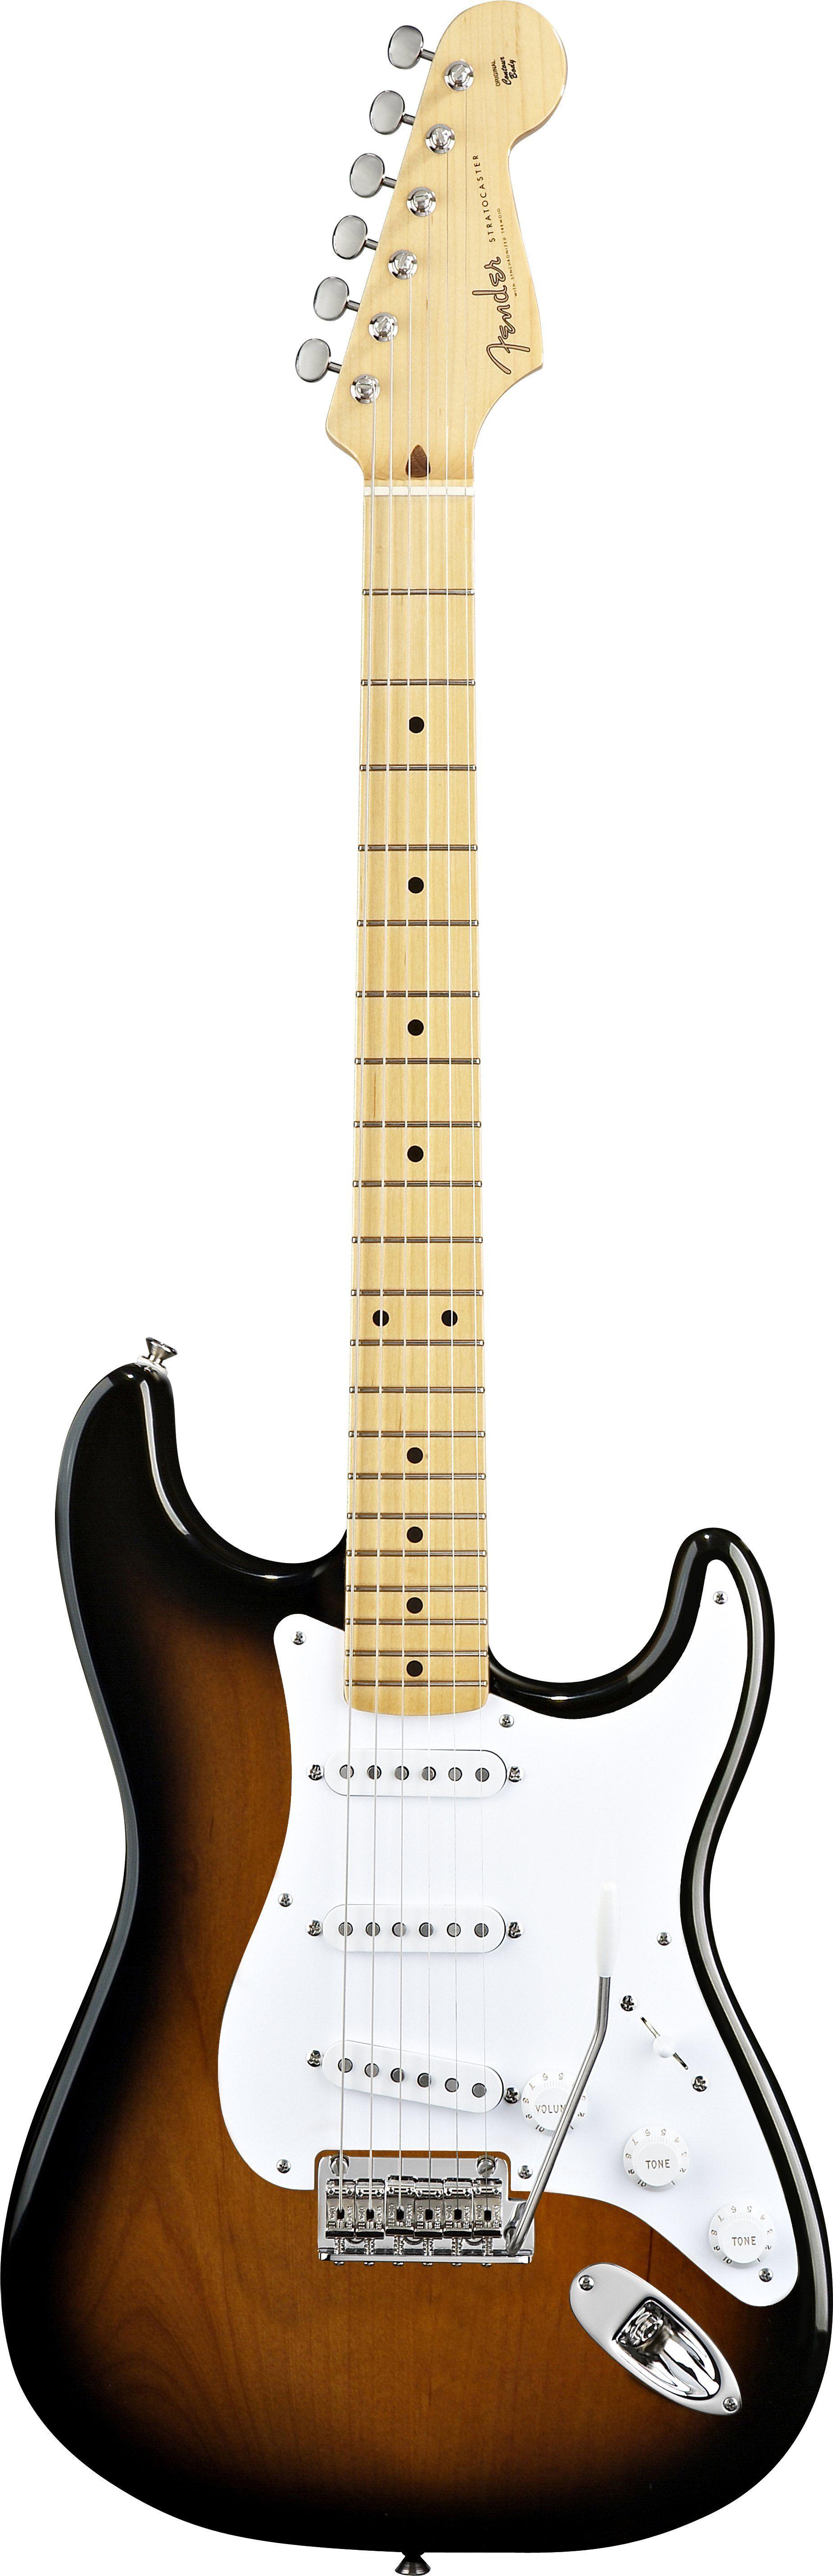 Fender Classic 50s Strat 2 Colour Sunburst  - Andertons Music Co.